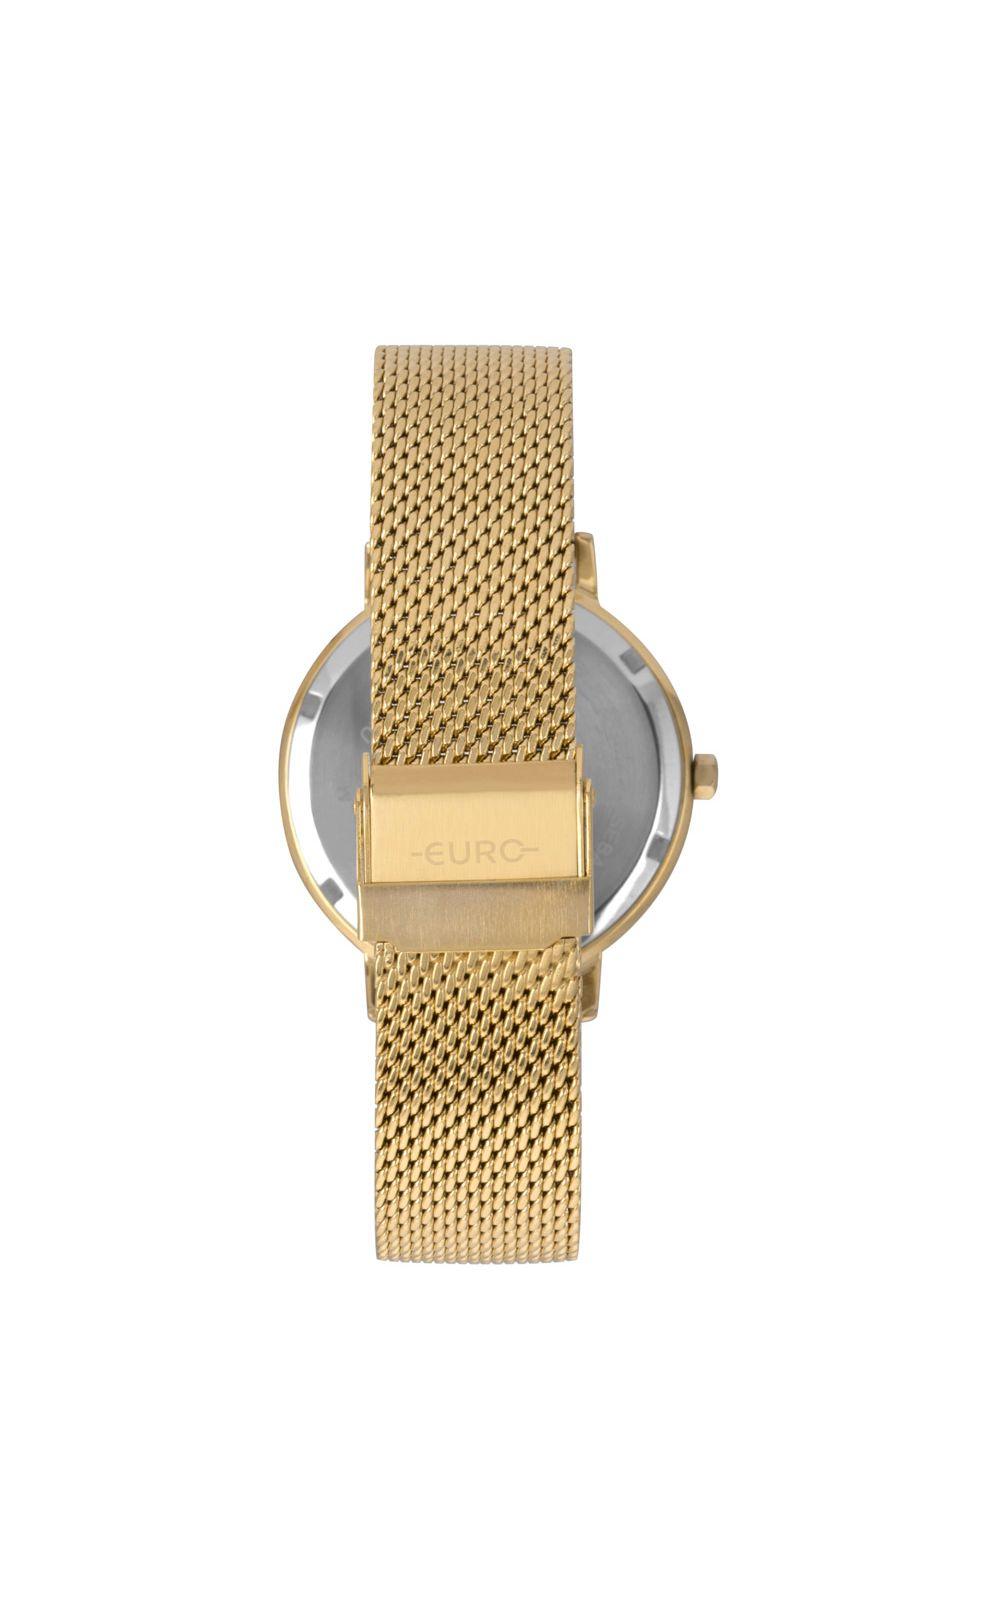 Foto 3 - Relógio Euro Crystal Move Feminino Dourado EU2035YRU/4P